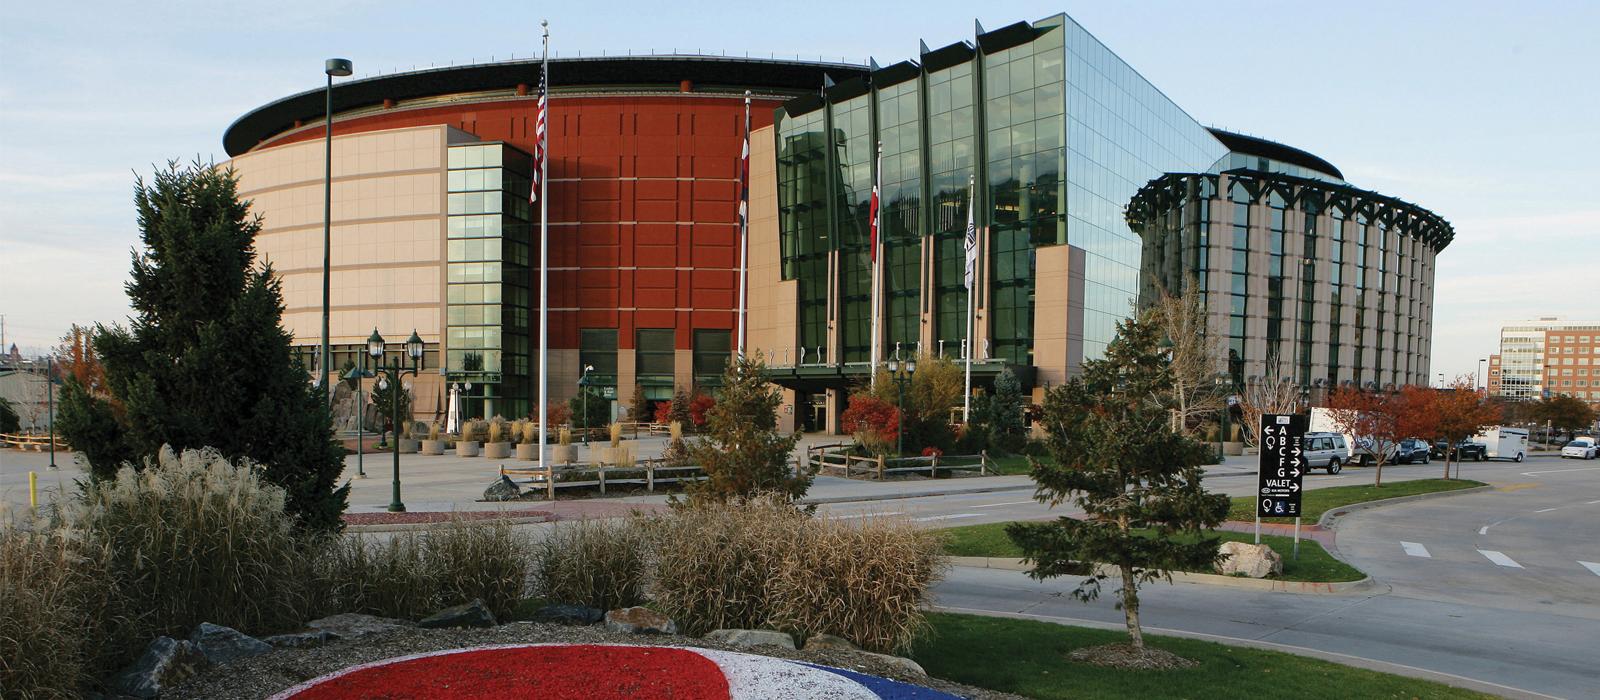 Pepsi Center Achieves 50% Increase in Event Productivity